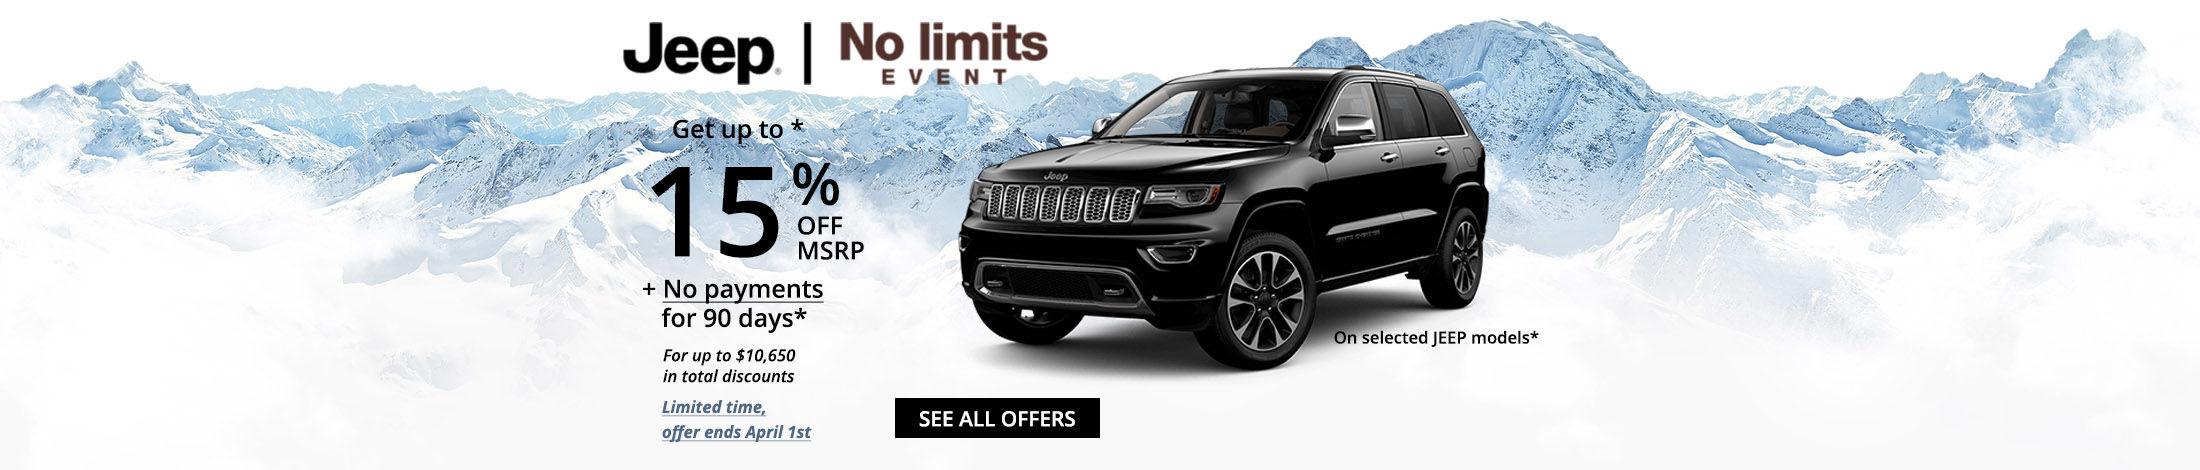 Jeep no limits event